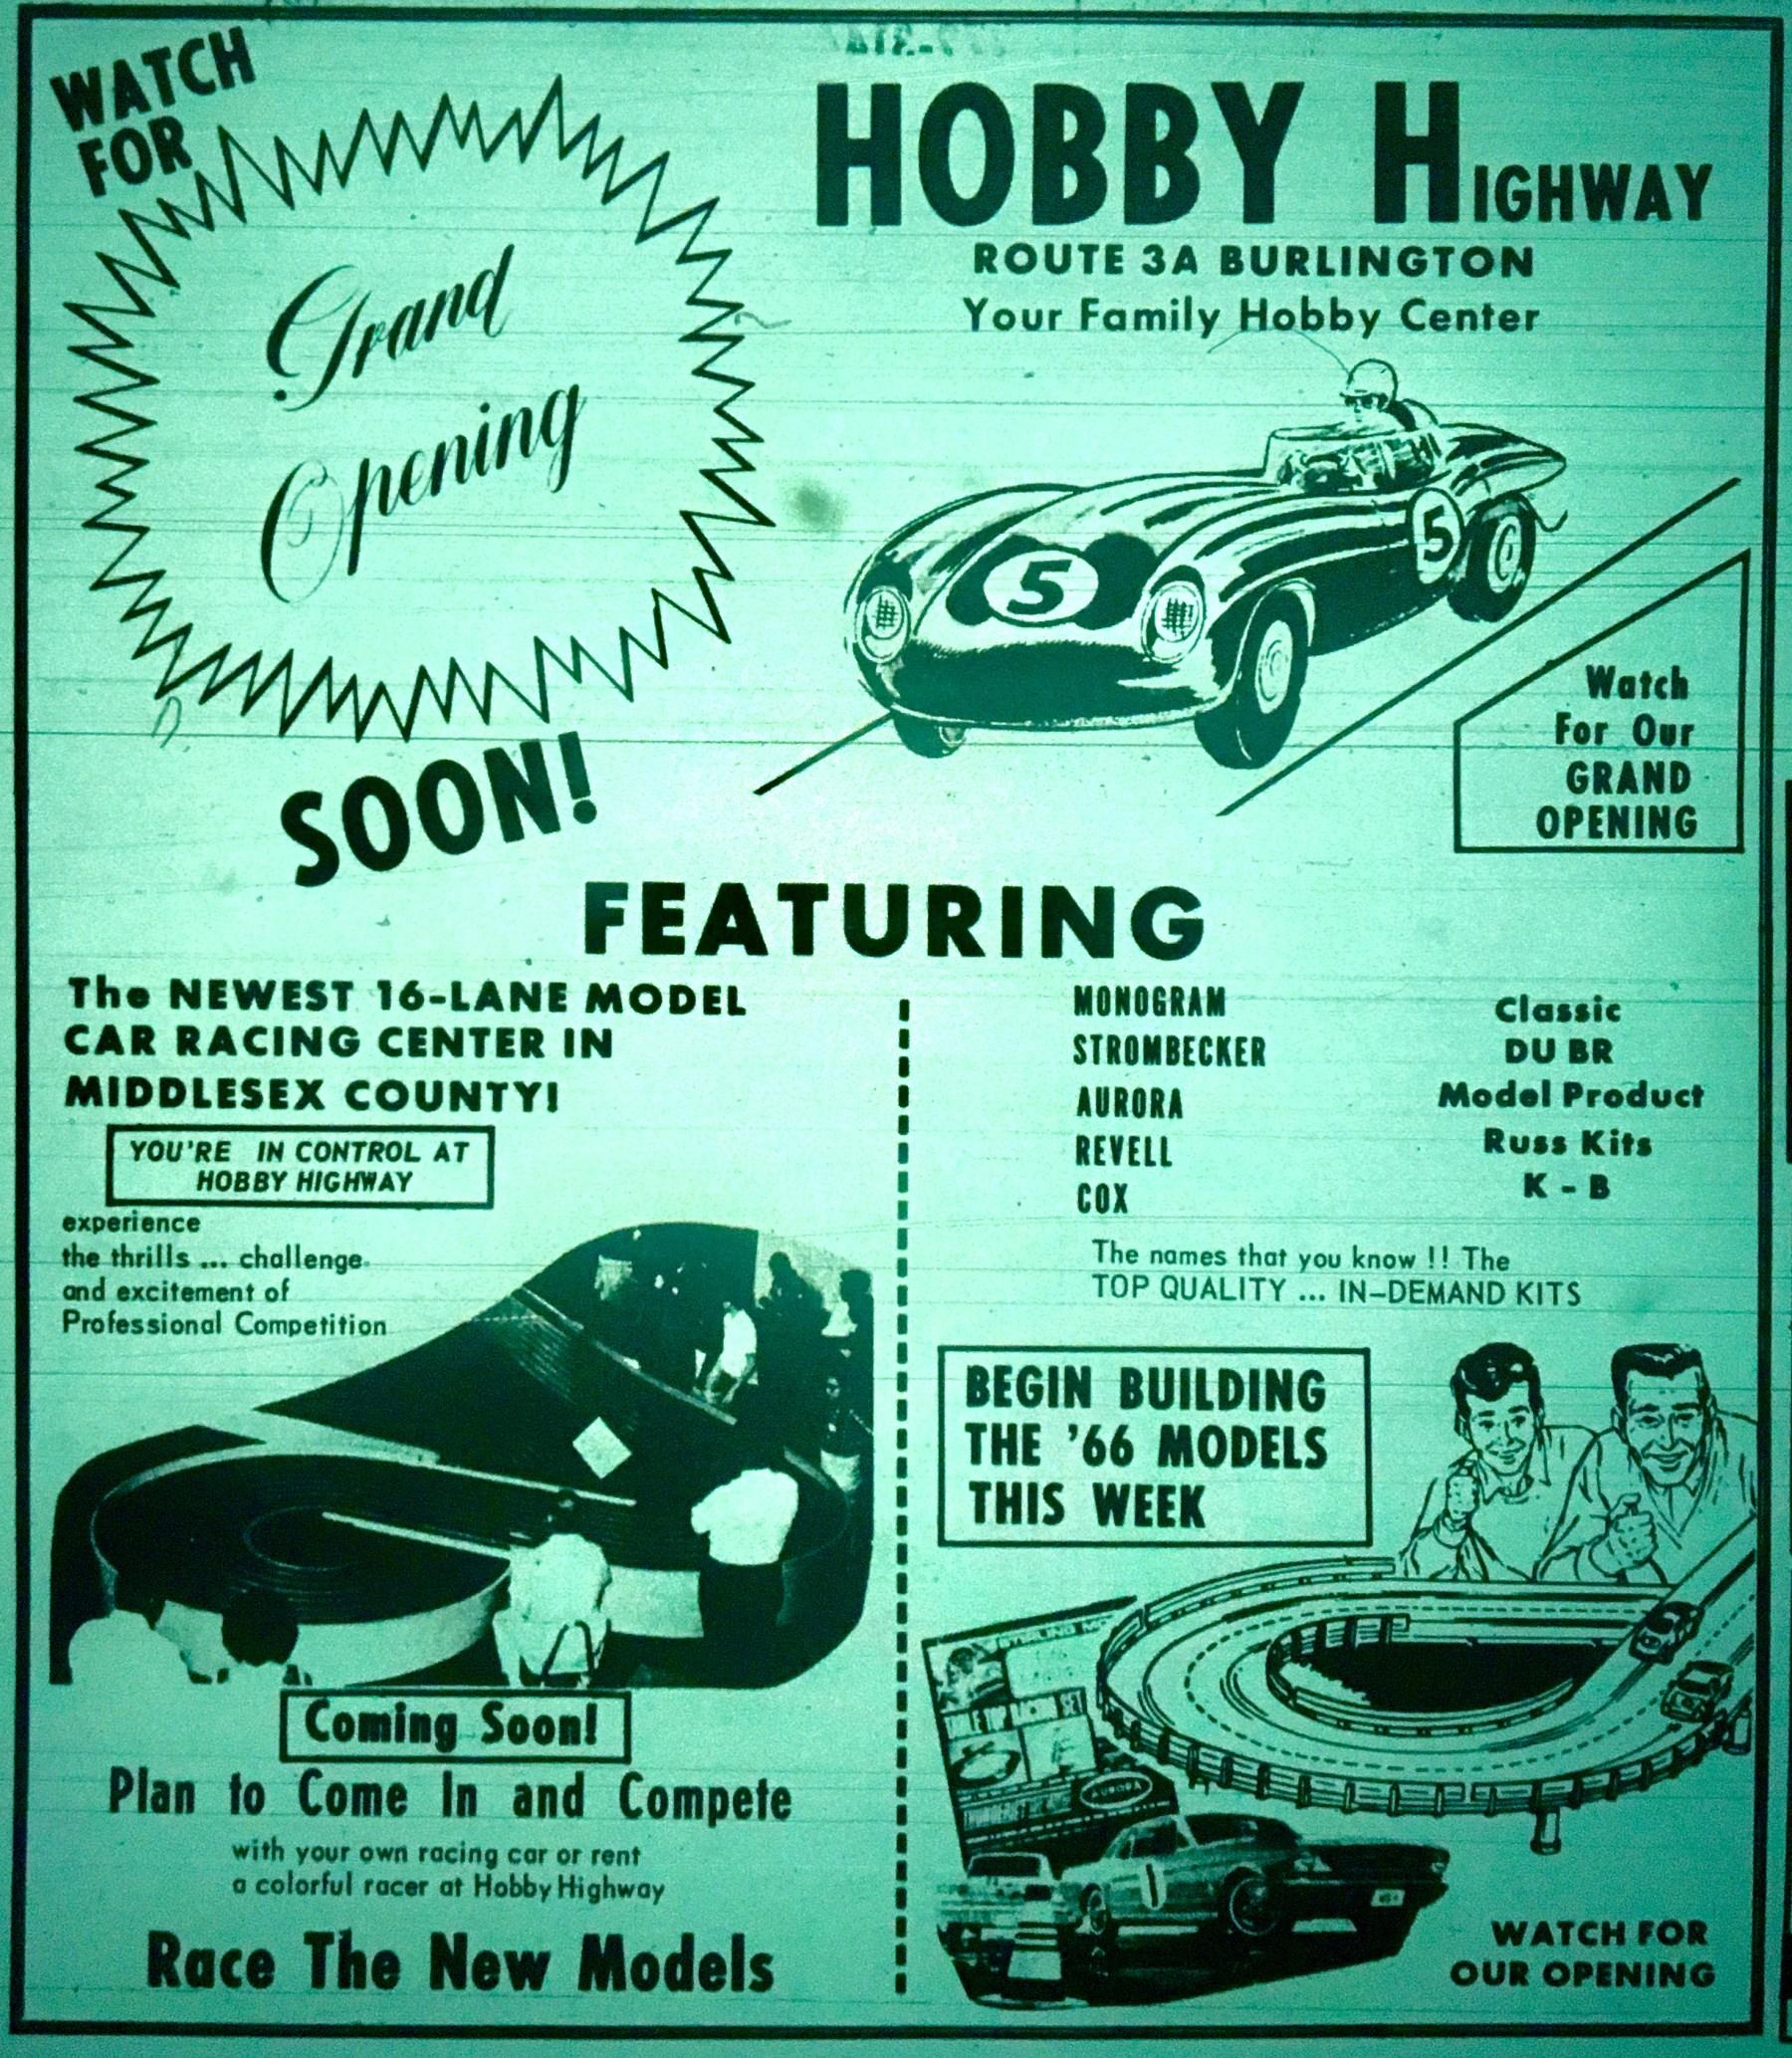 Hobby Highway, Burlington MA